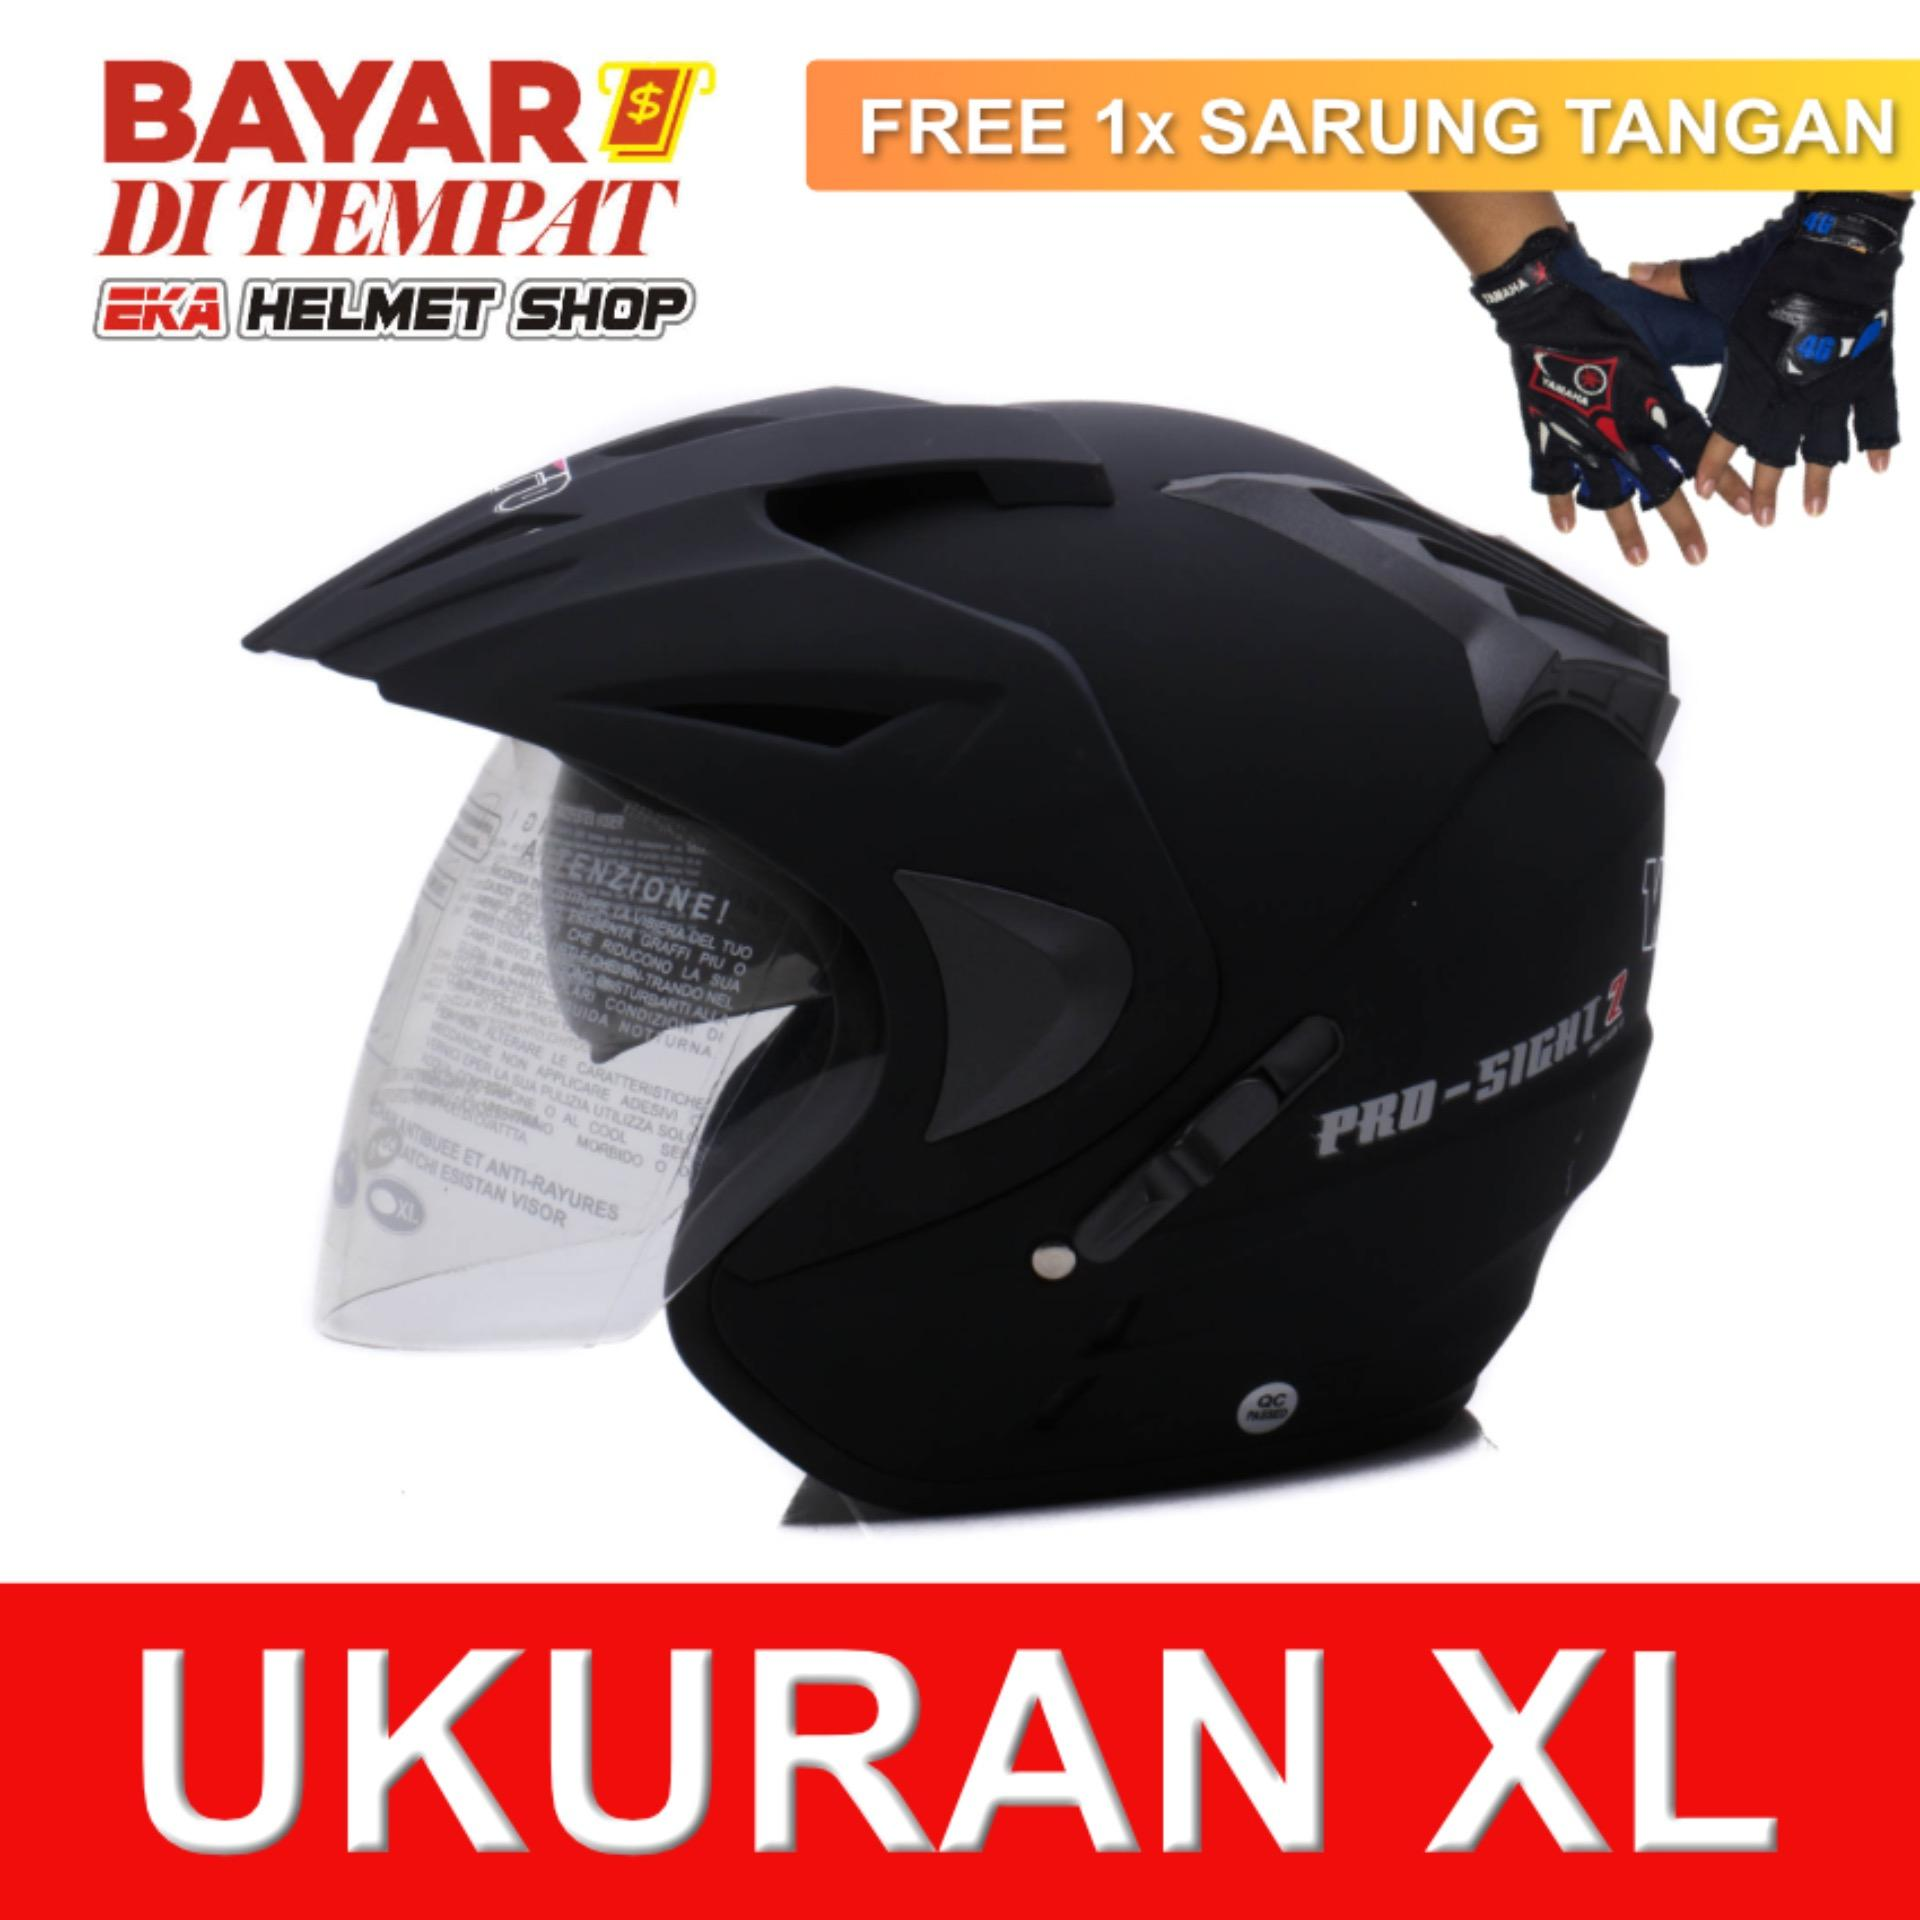 Promo Wto Helmet Pro Sight Hitam Doff Promo Gratis Sarung Tangan Akhir Tahun